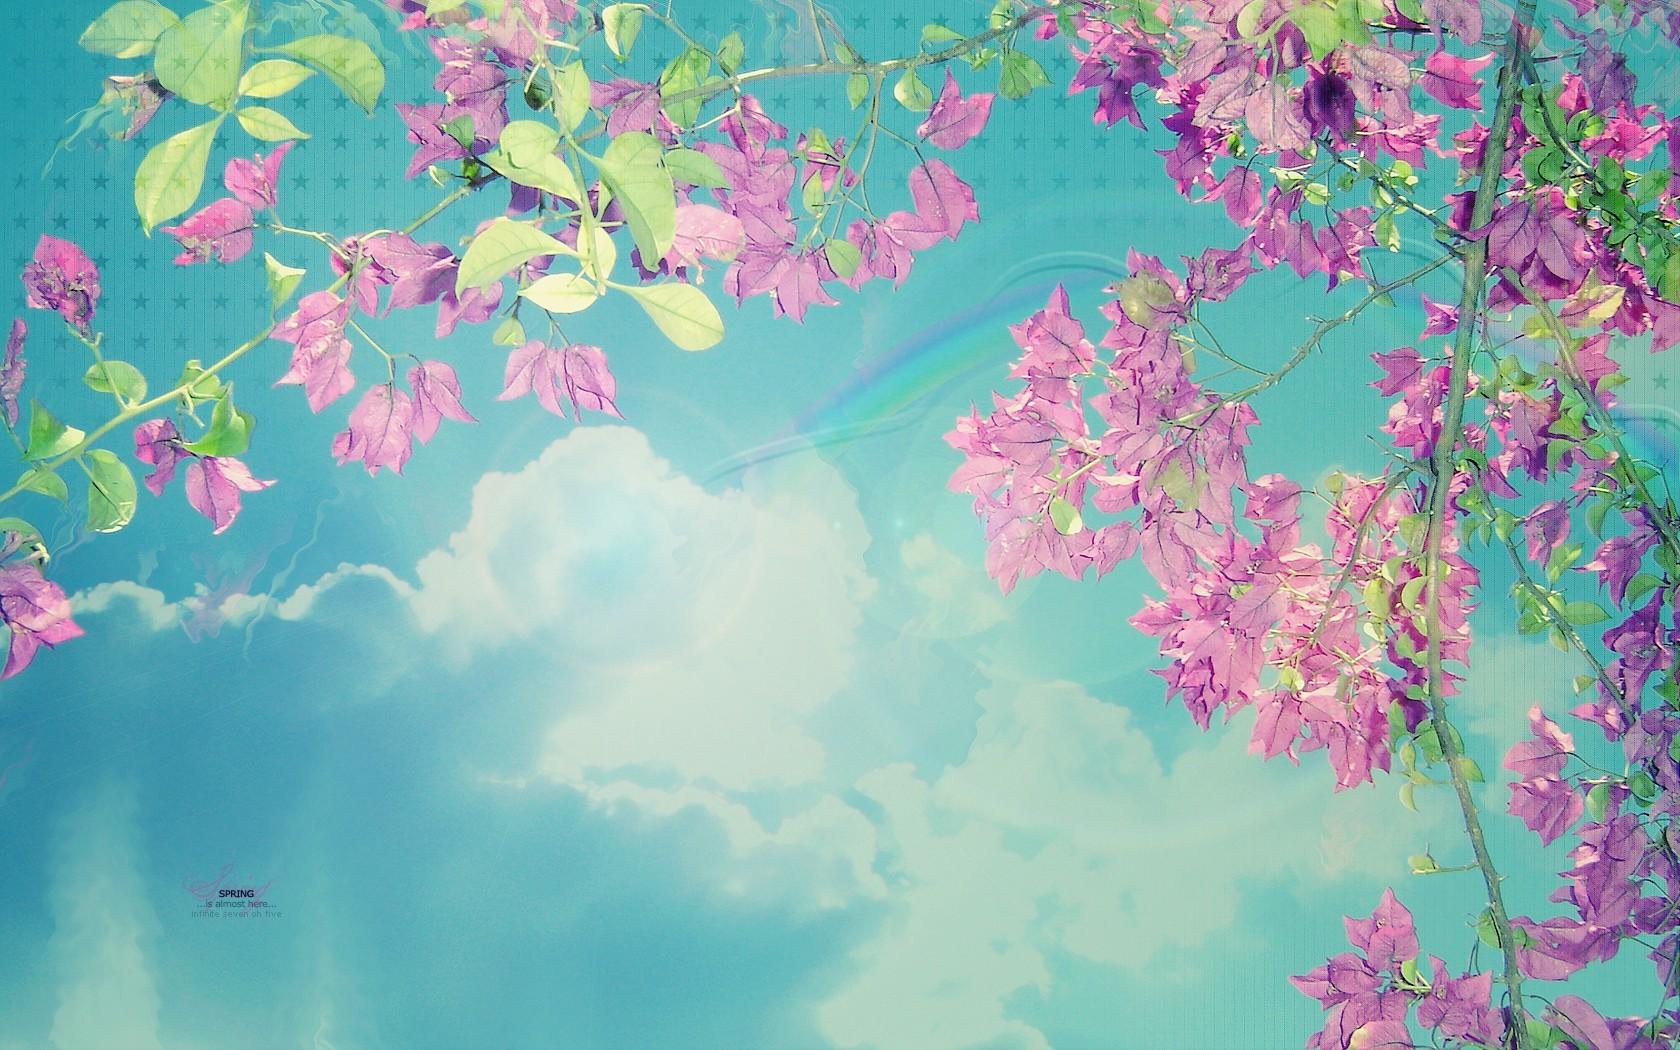 фоновые картинки на телефон весна один вариант